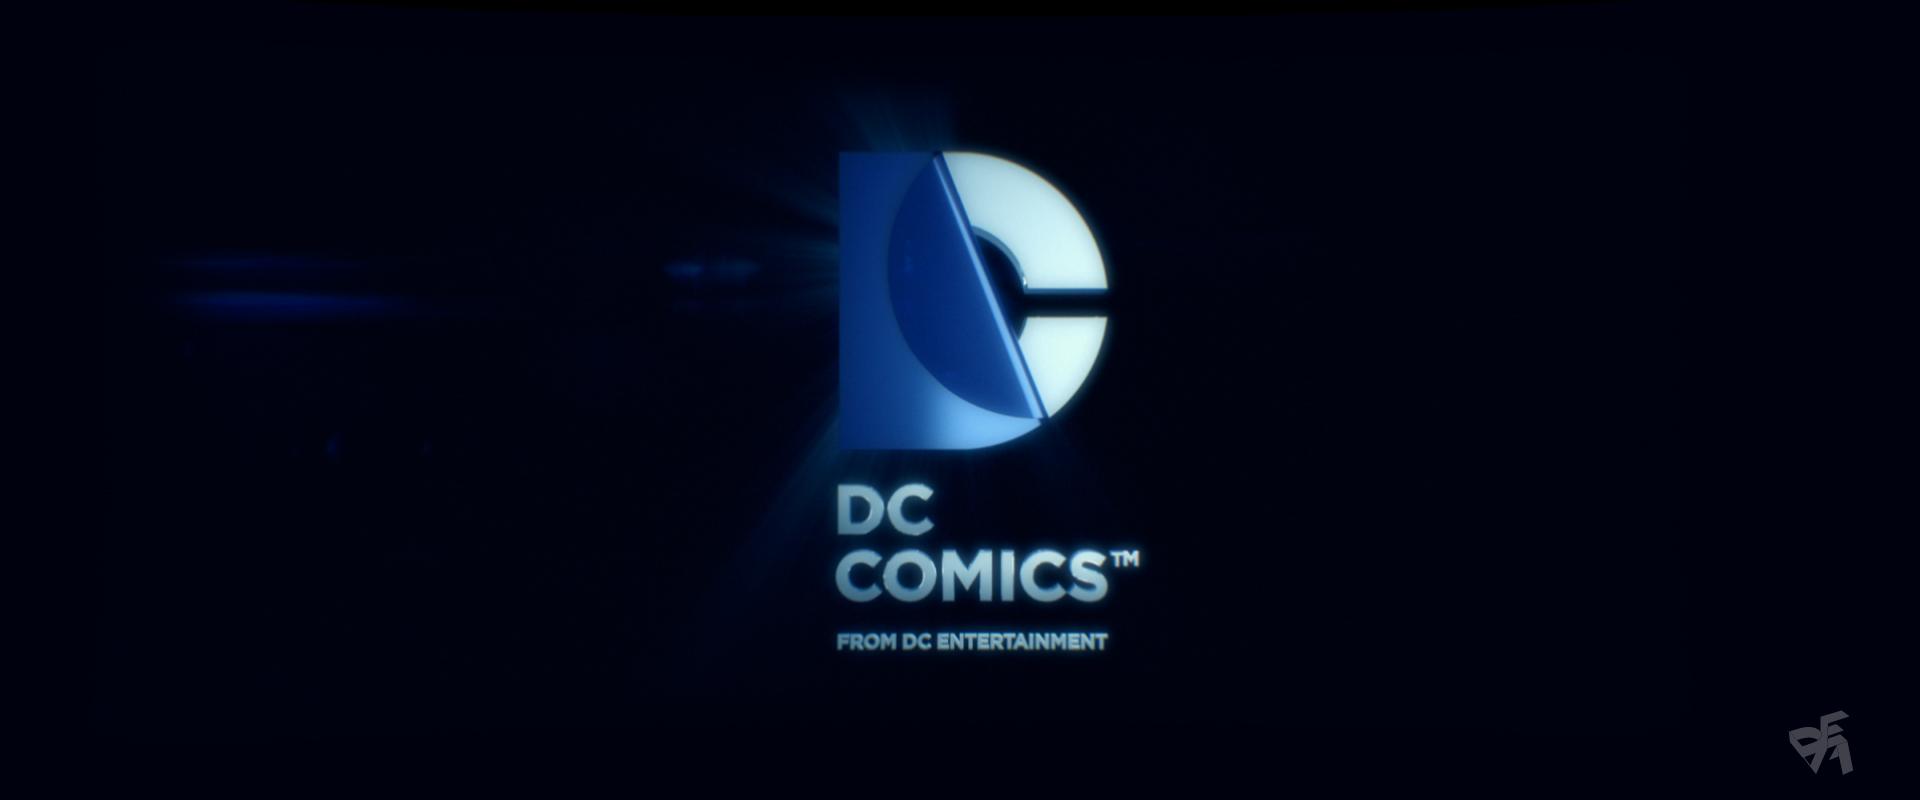 DC_STORYBOARD1_08.jpg